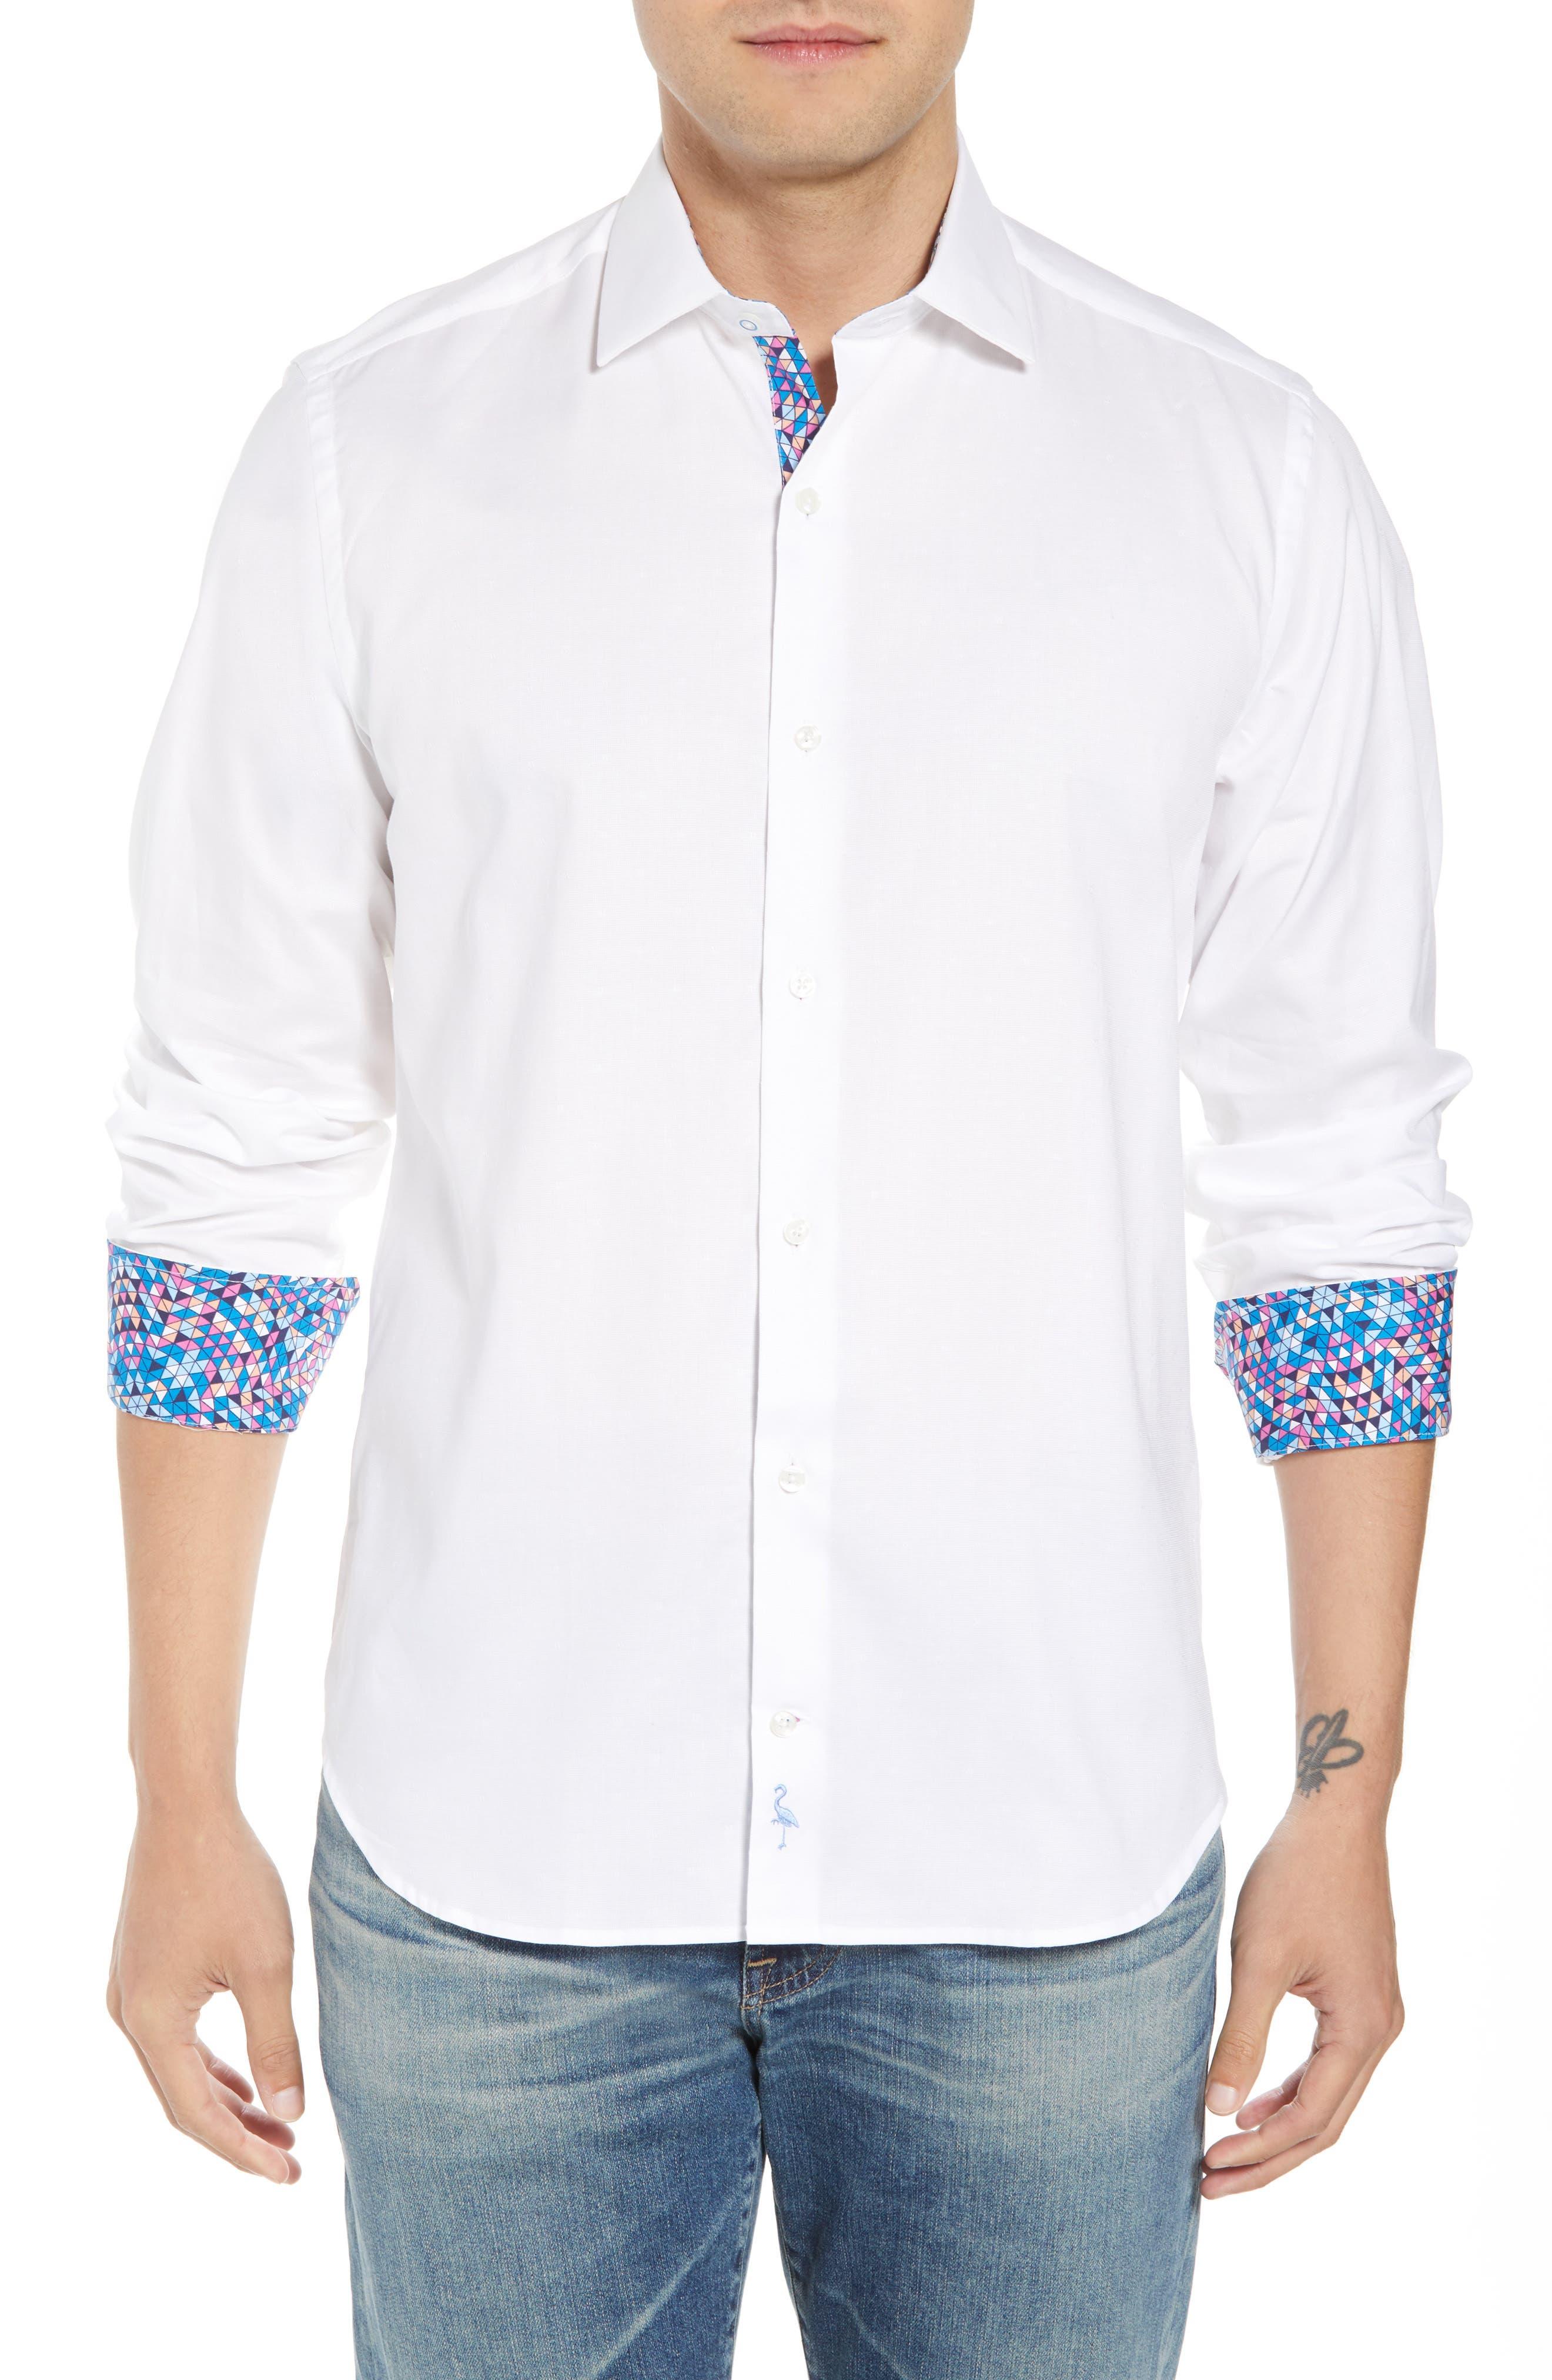 Baxley Regular Fit Sport Shirt,                             Main thumbnail 1, color,                             White